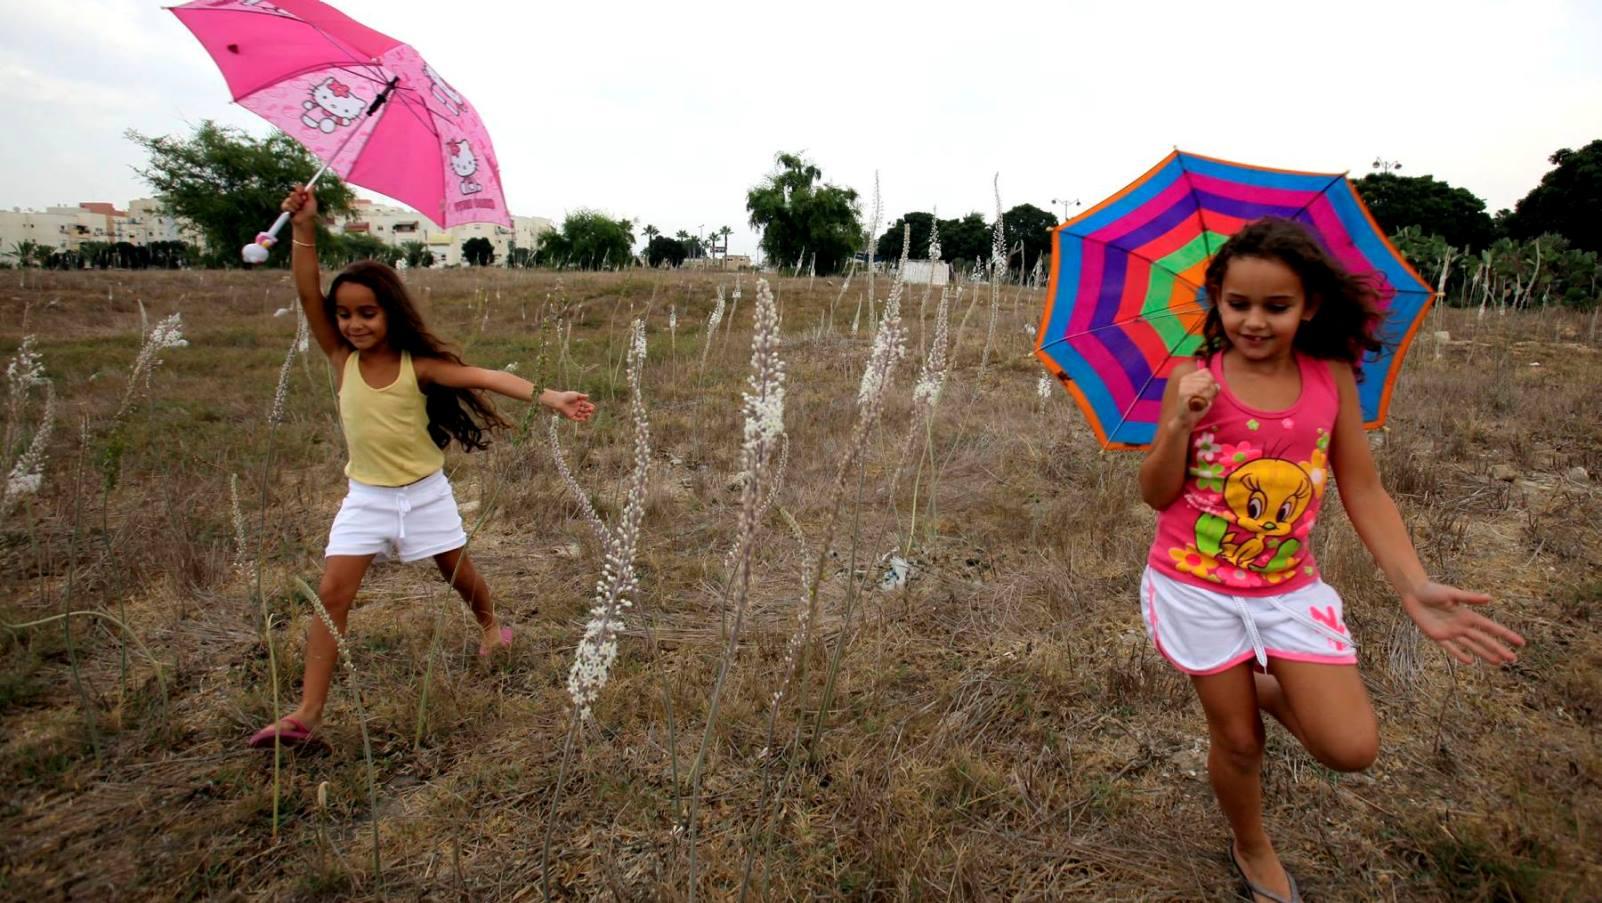 Children in Ashkelon celebrating the first rain of the season. Photo by Edi Israel/FLASH90